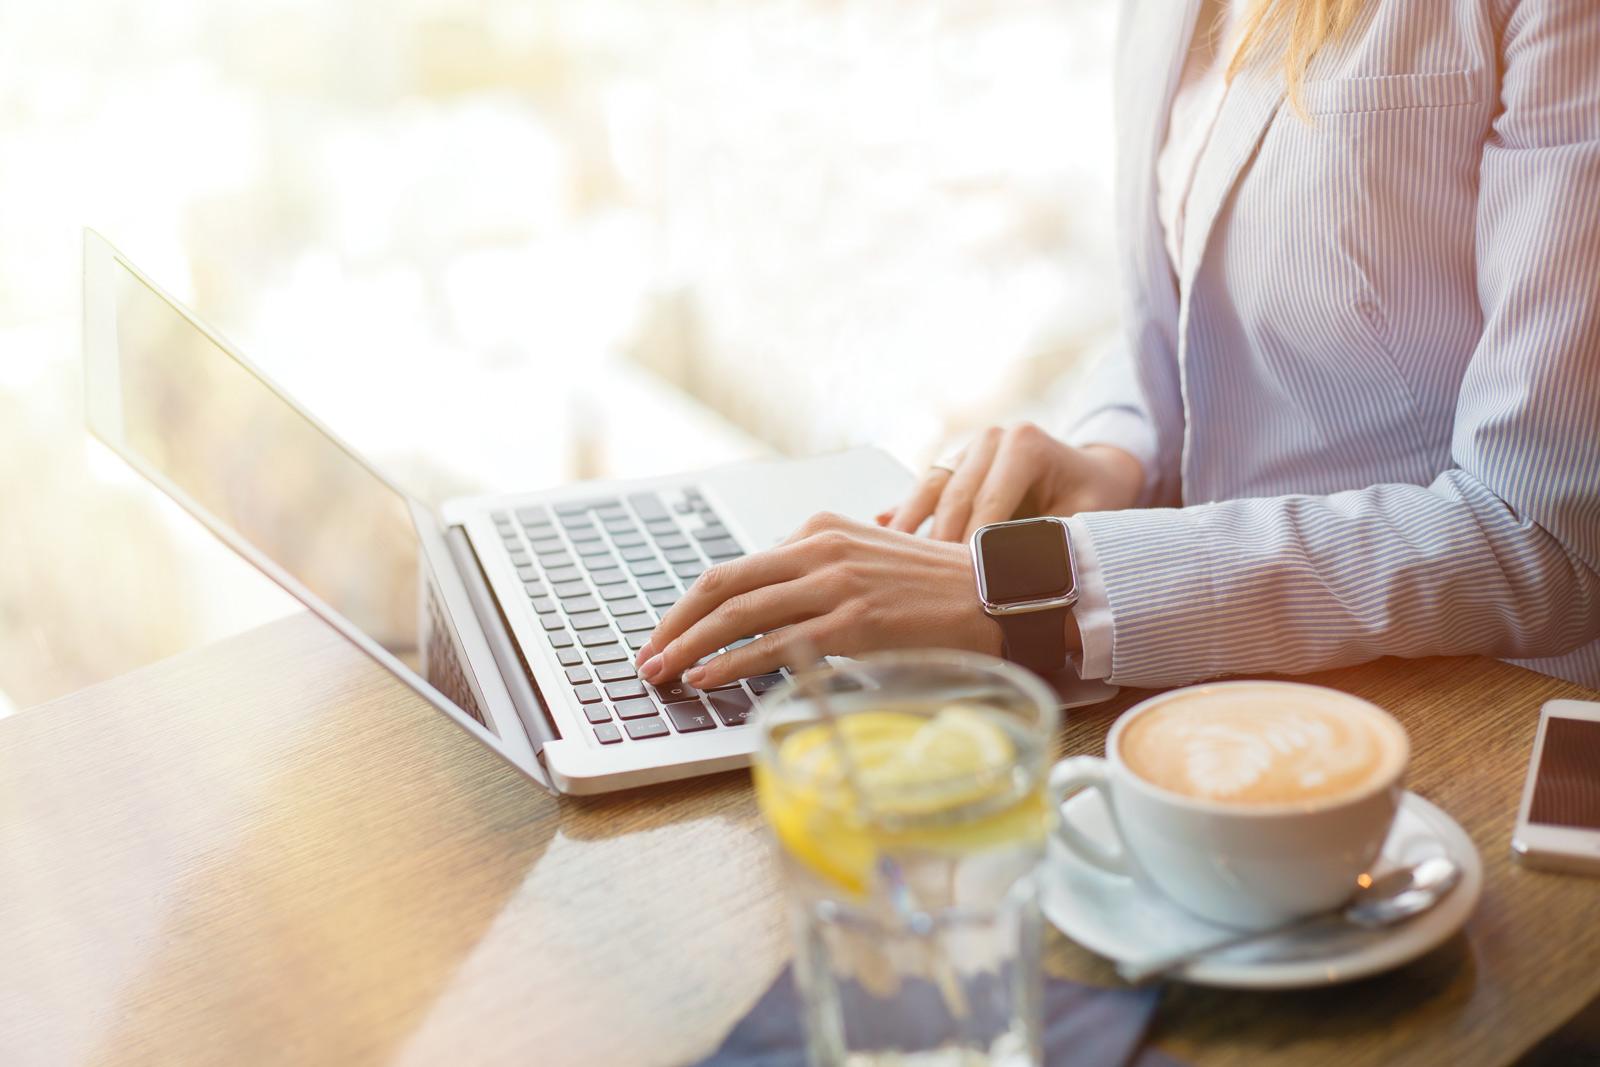 Frau arbeitet im Restaurant am Laptop